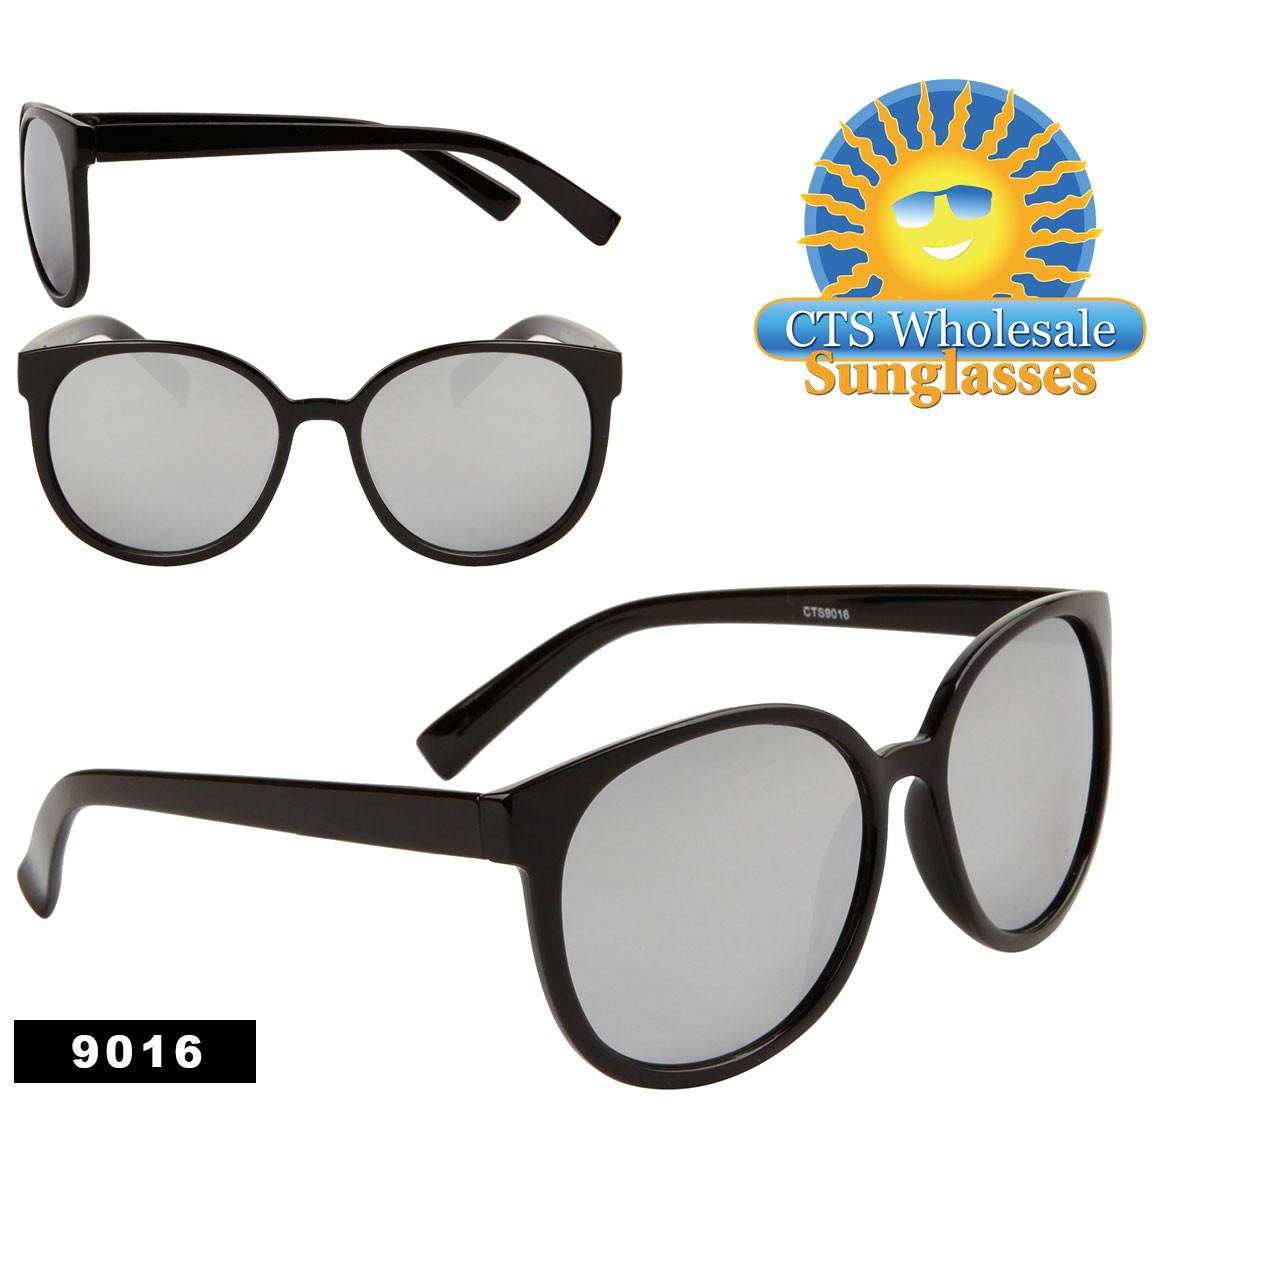 Bulk Mirrored Wholesale Sunglasses - Style #9016